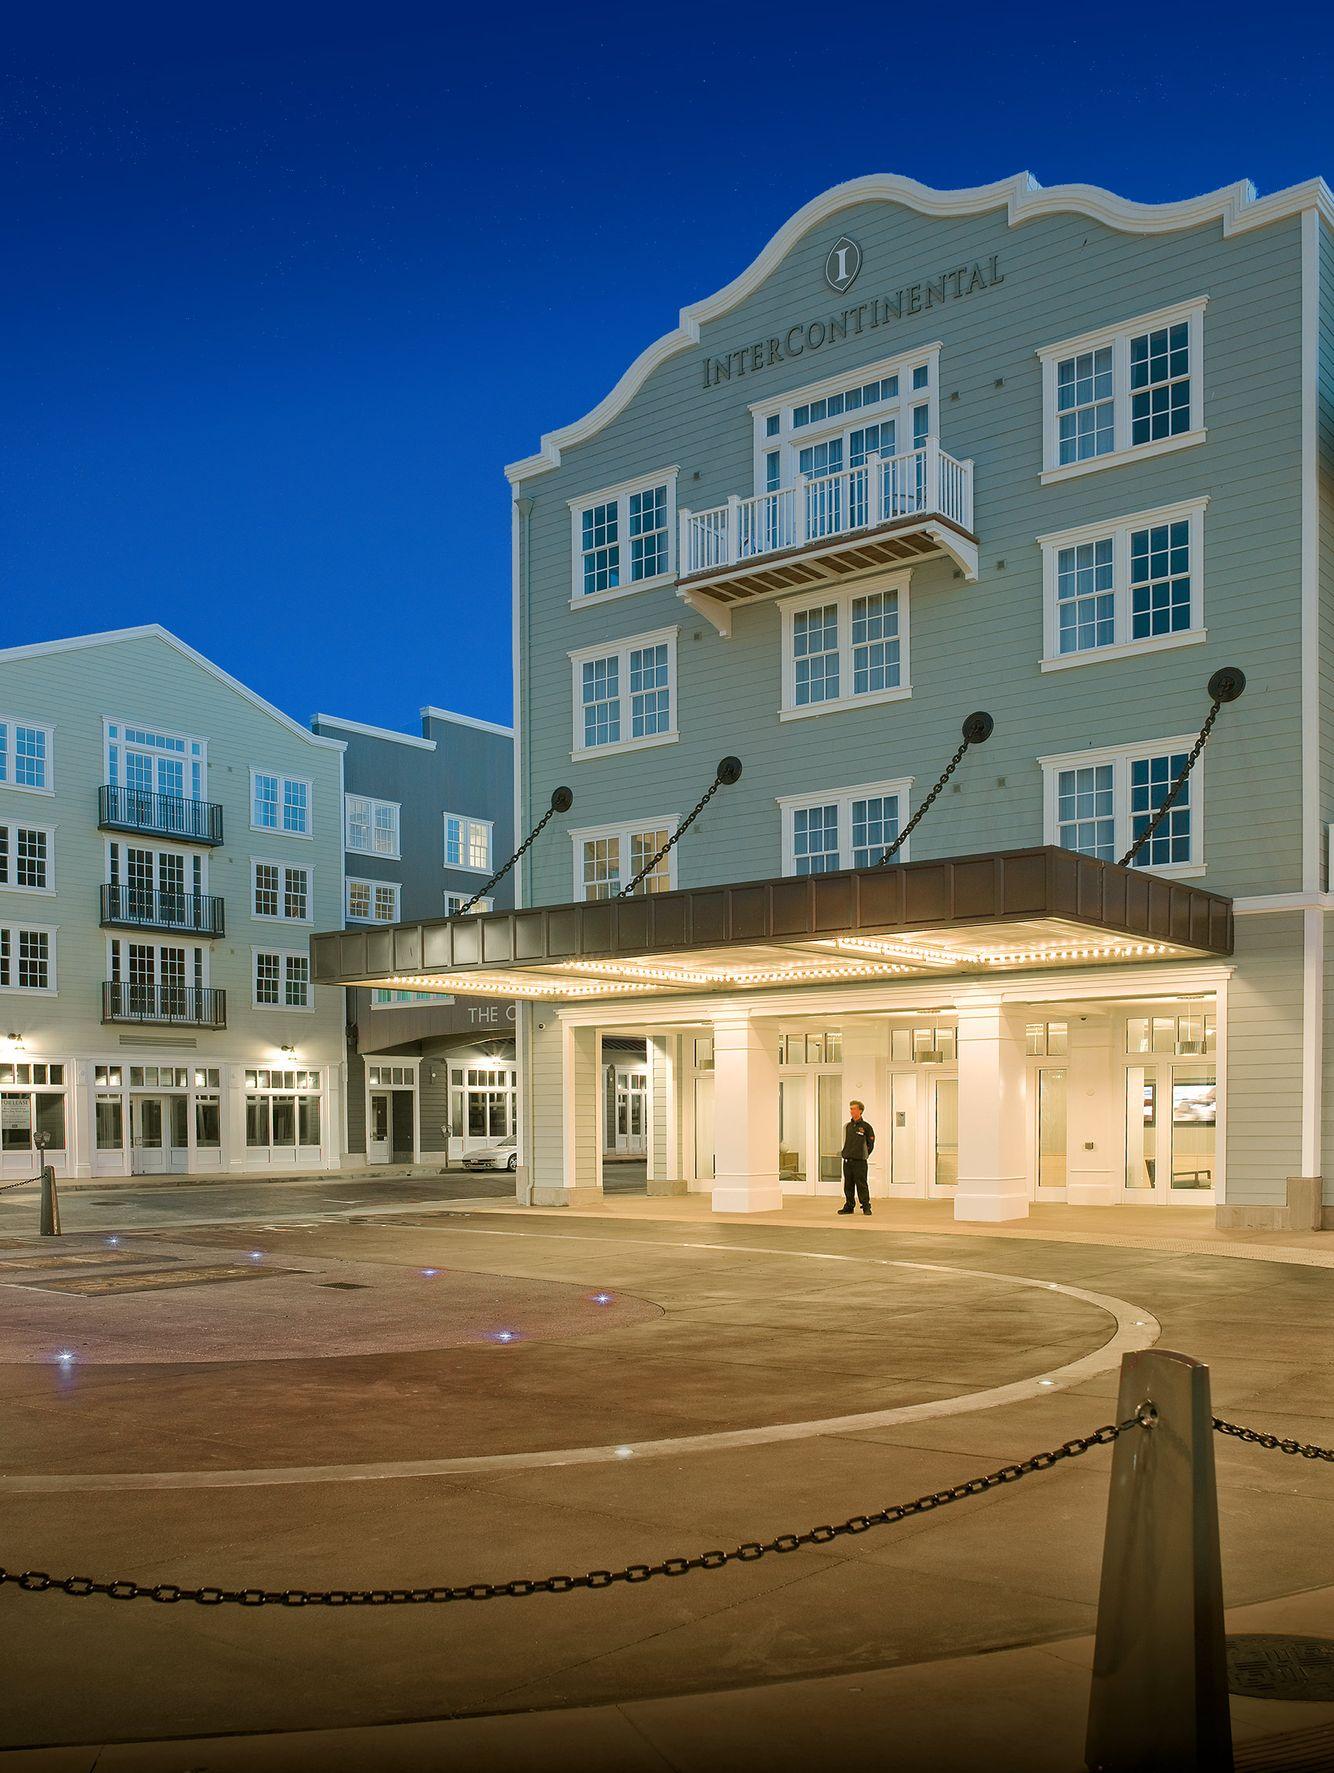 John-Sutton-Photography-InterContinental Hotel Monterey Bay Entry